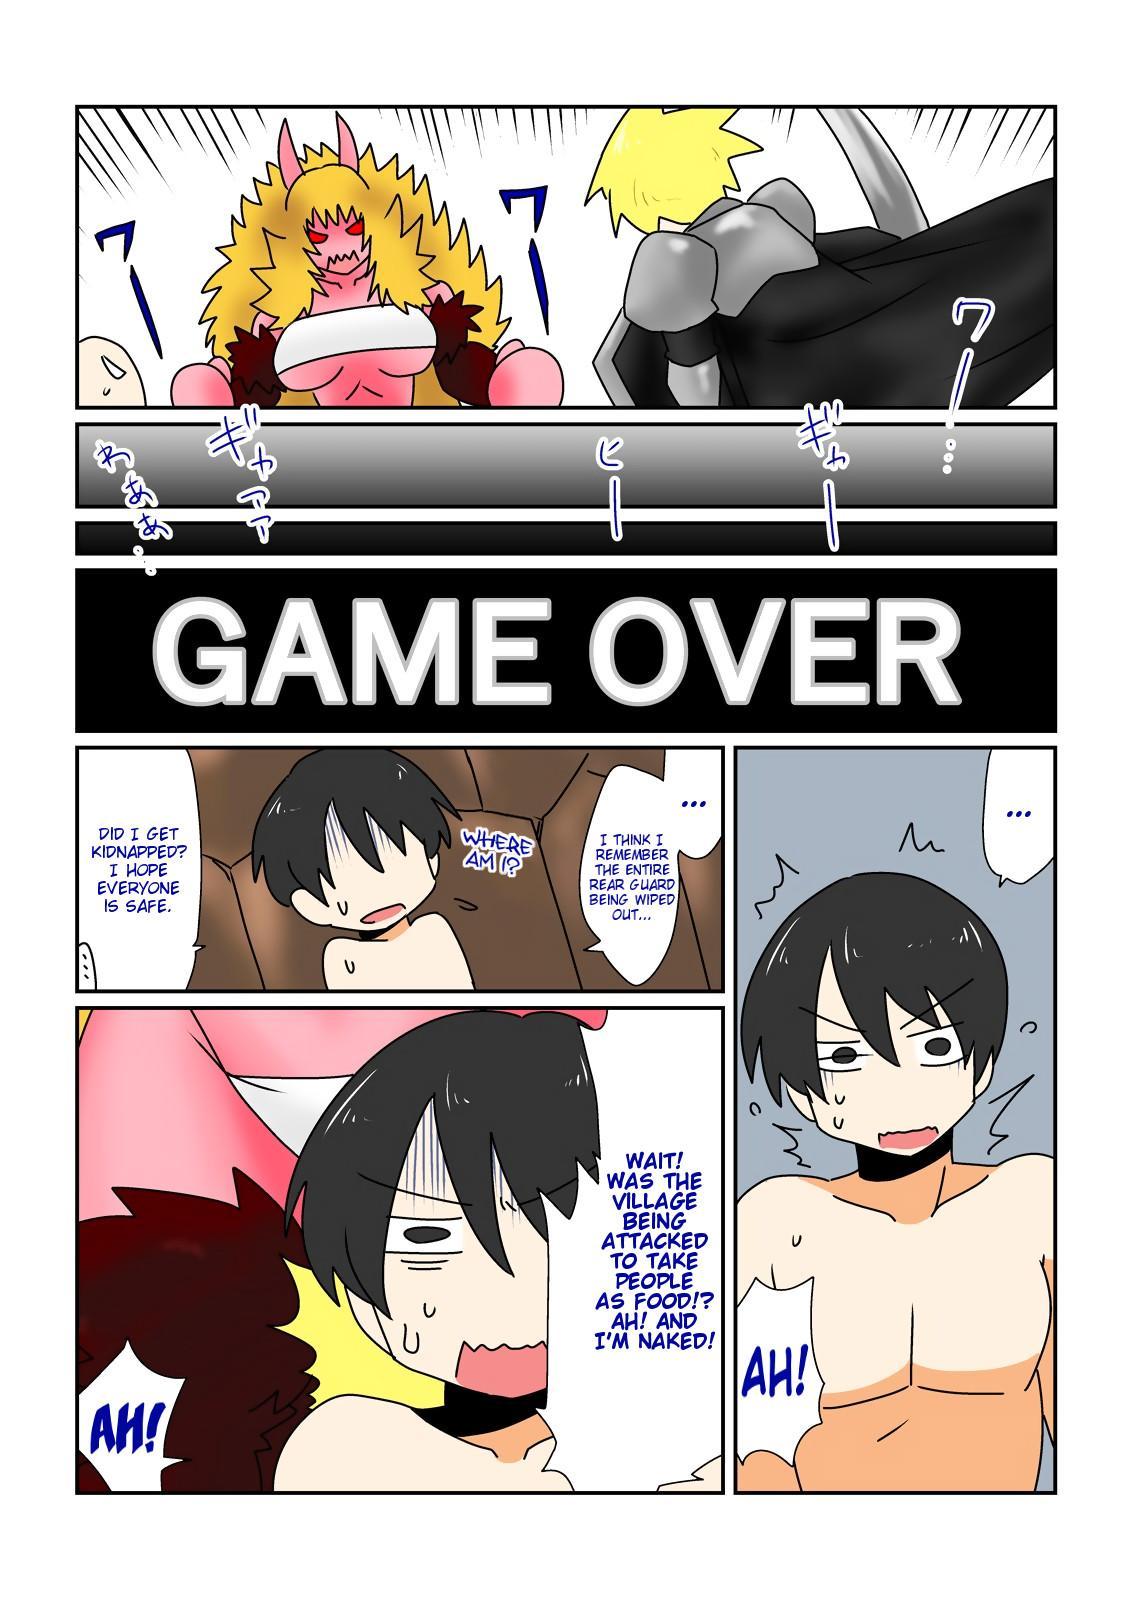 [Hroz] Game Over -Akahada Ogre Musume Hen- | Game Over 〜Red Skin Ogre Girl Edition〜 [English] [Digital] {Erelzen} 1